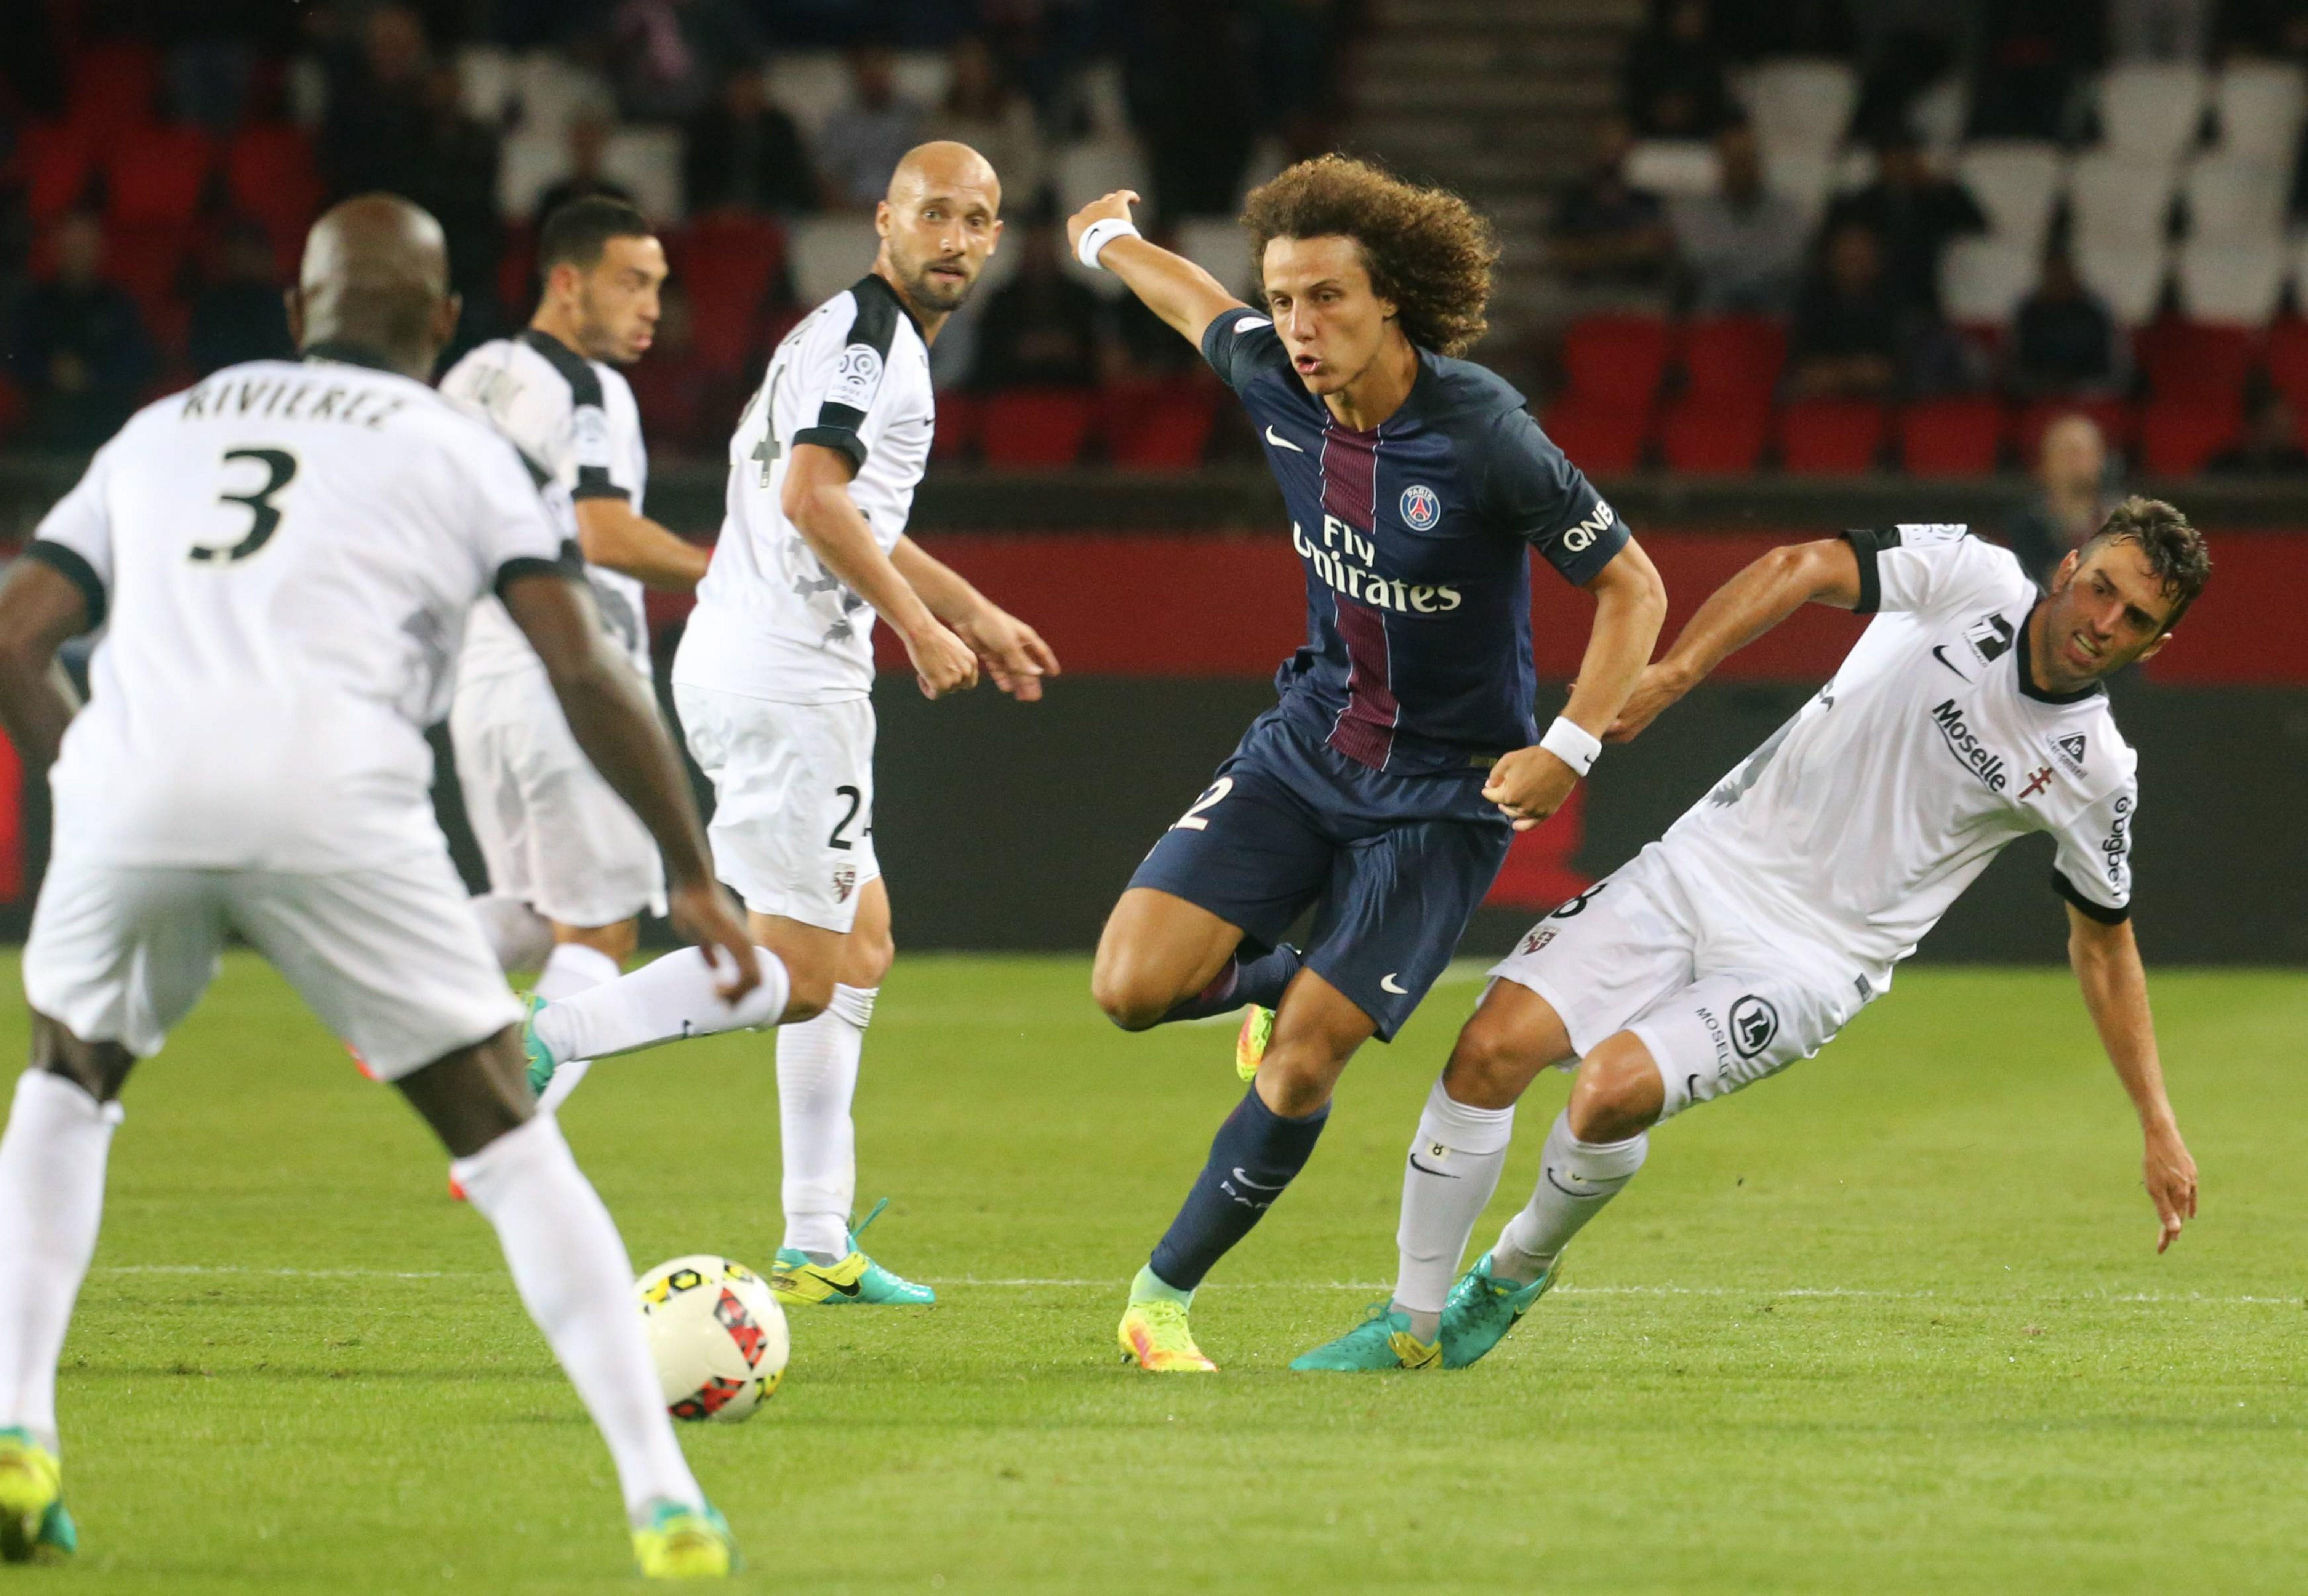 David Luiz: Another Chelsea signing in desperation